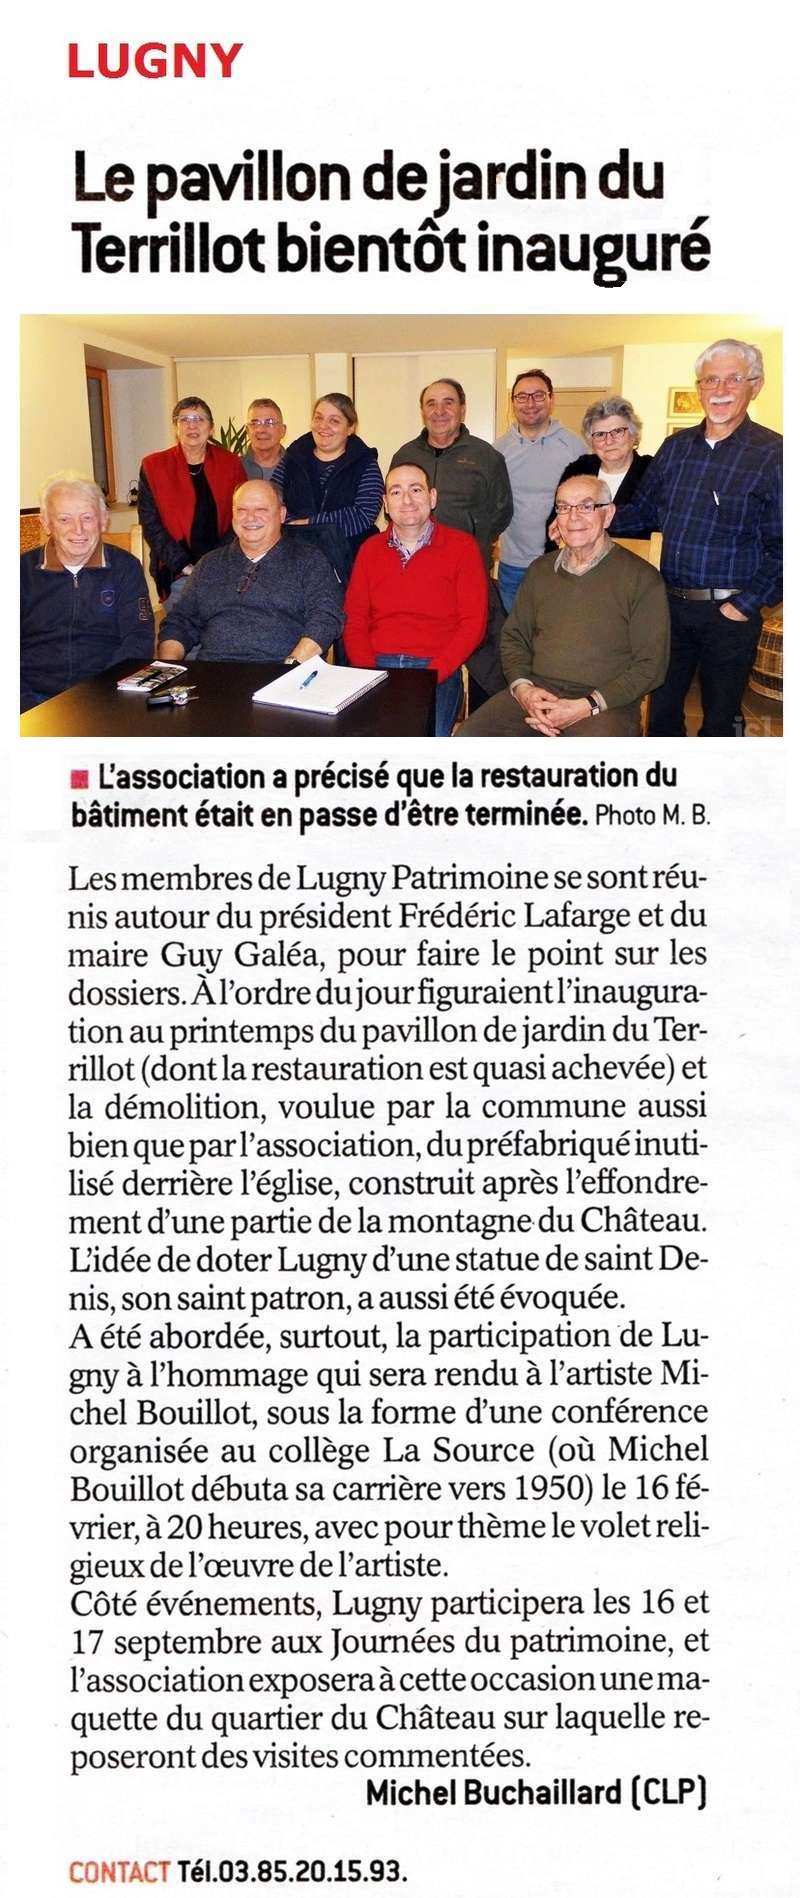 "Lugny : ""Le pavillon de jardin du Terrillot bientôt inauguré"" (Le JSL du samedi 21 janvier 2017). Lugny_12"